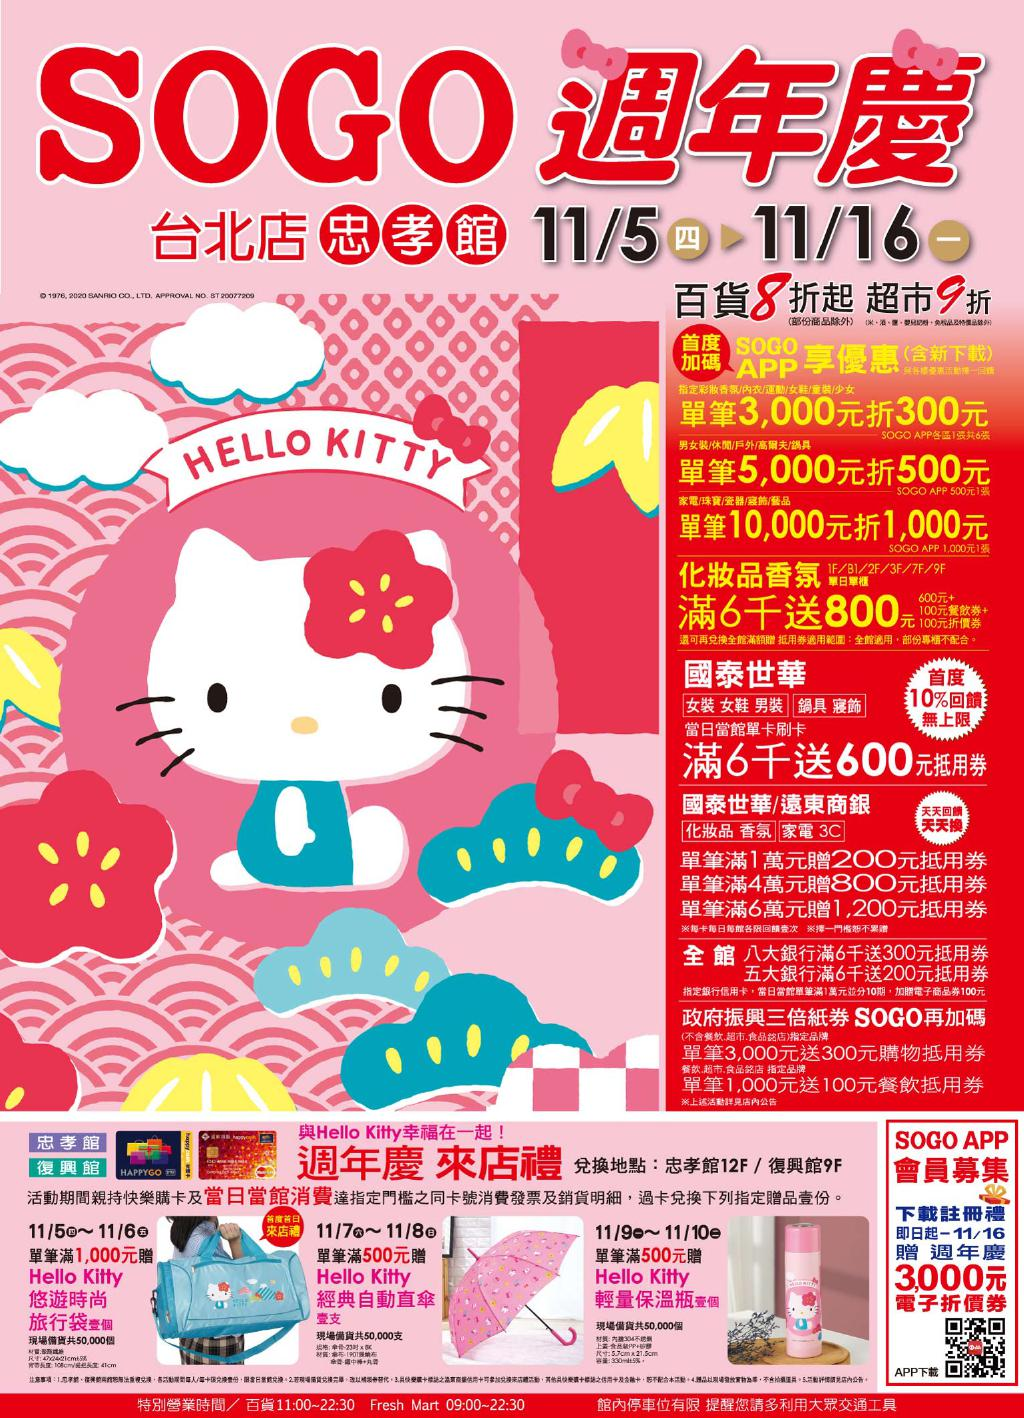 SOGO《台北忠孝館》DM 「週年慶」百貨8折 超市9折 【2020/11/16 止】